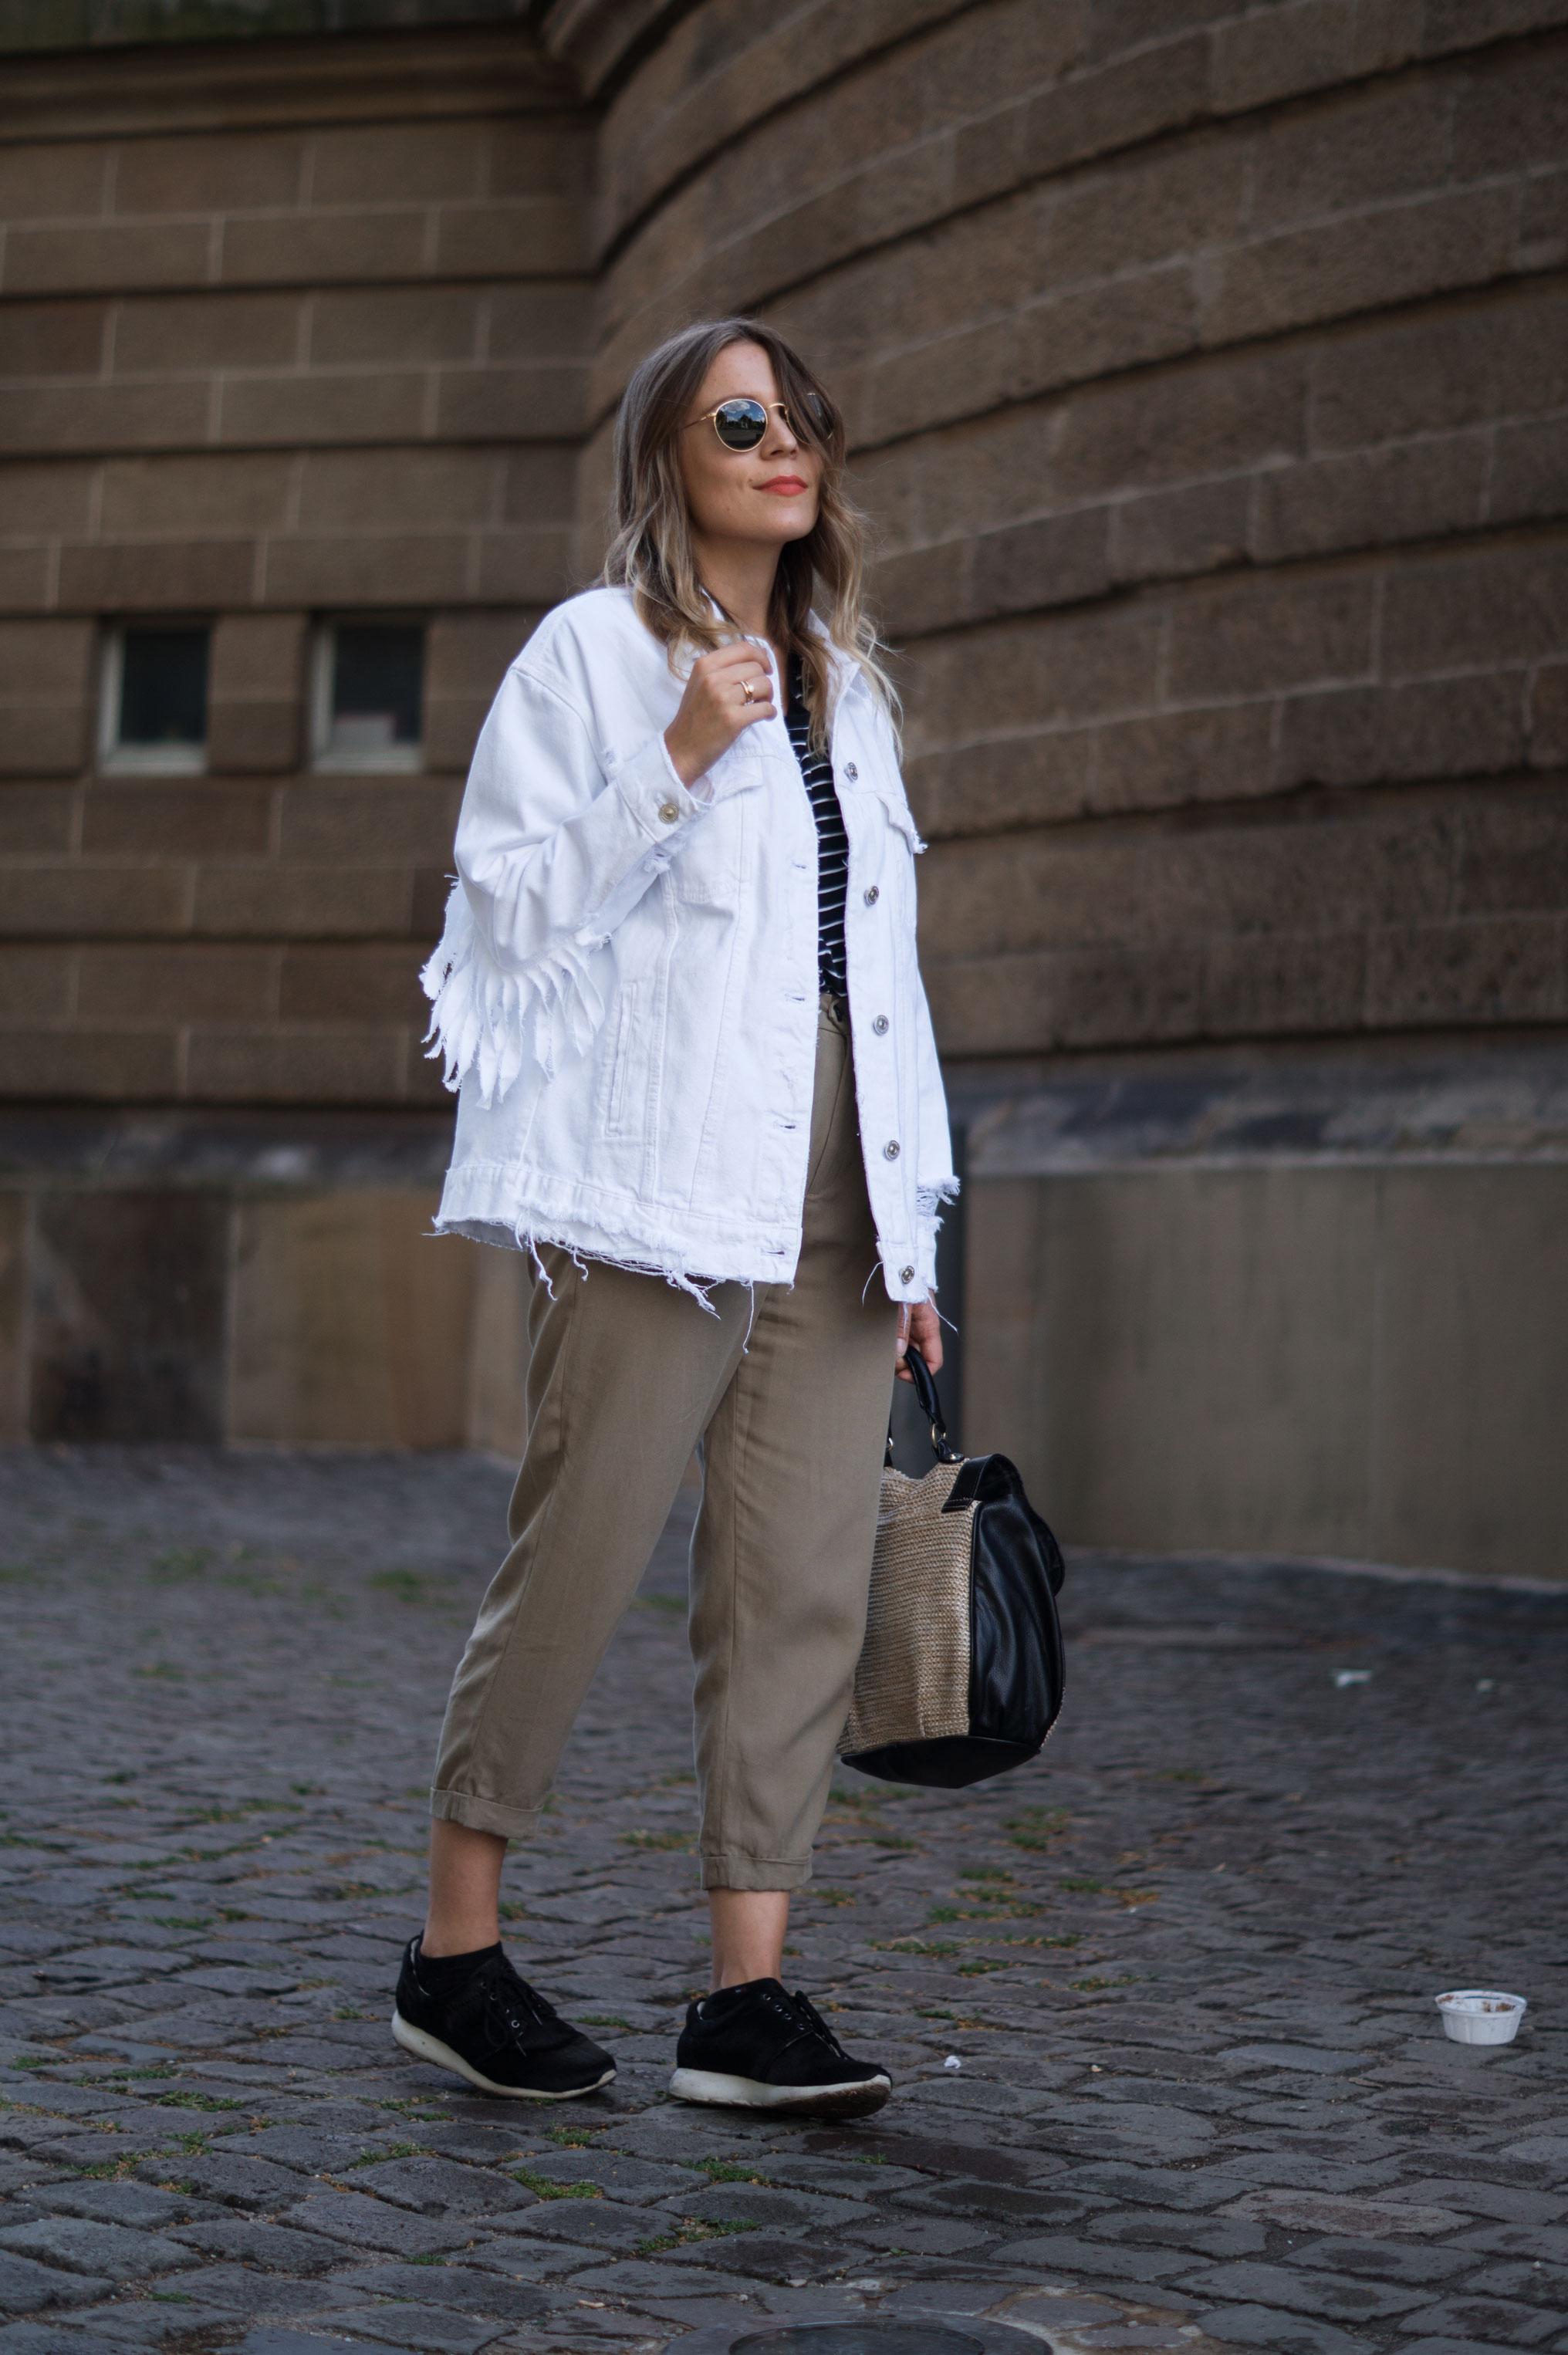 Fringed Denim Jacket Fransenjacke weiße Jeansjacke Casual Outfit Sariety Fashionblogger Modeblog Heidelberg Mannheim Wasserturm-7